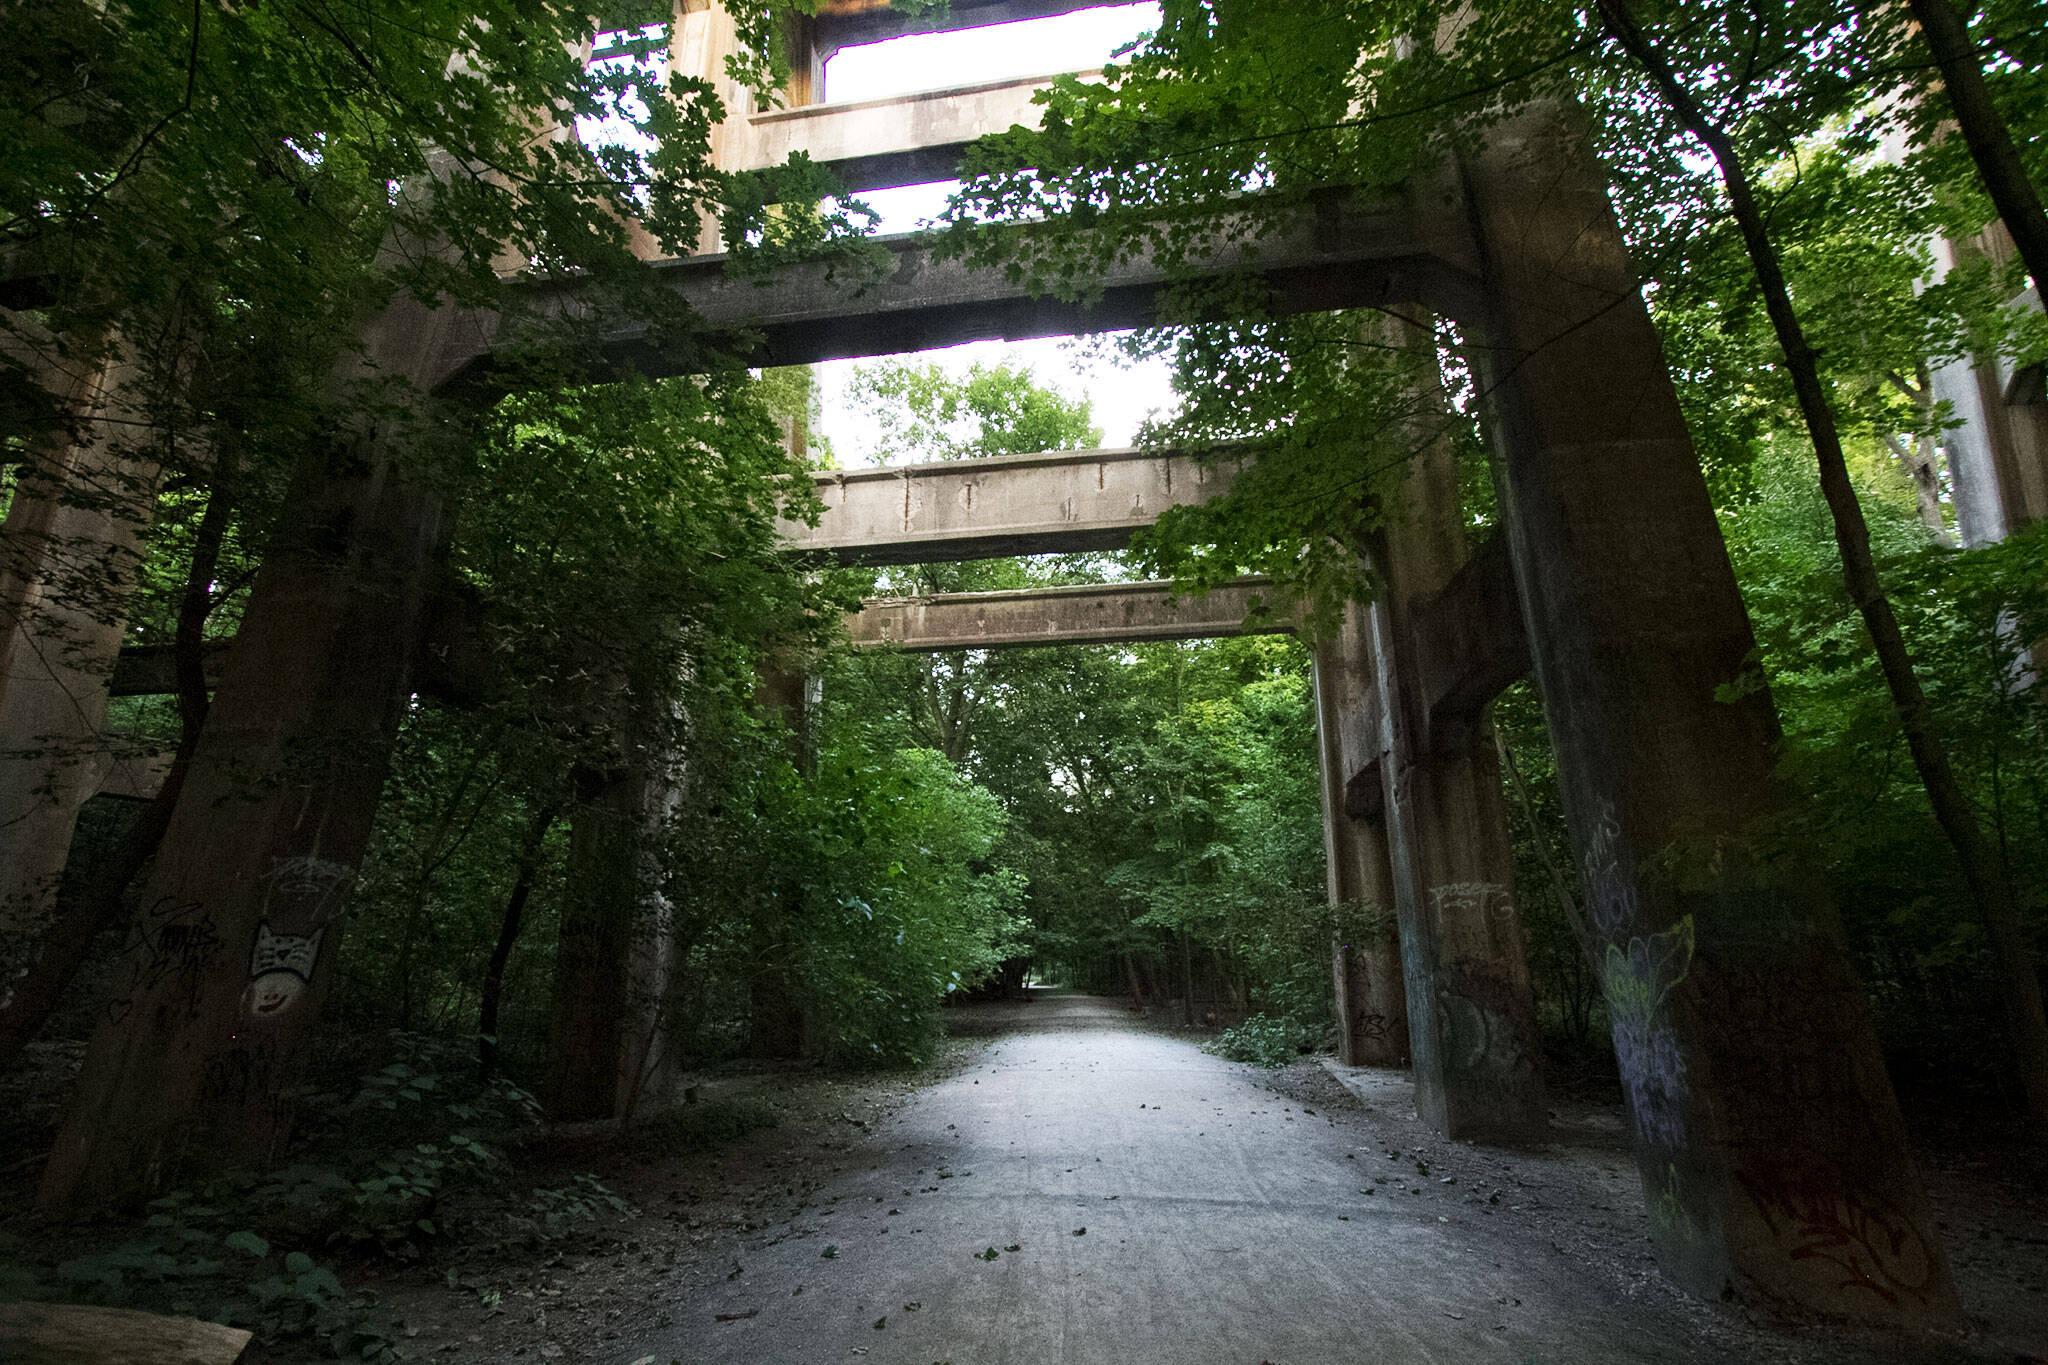 beltline trail